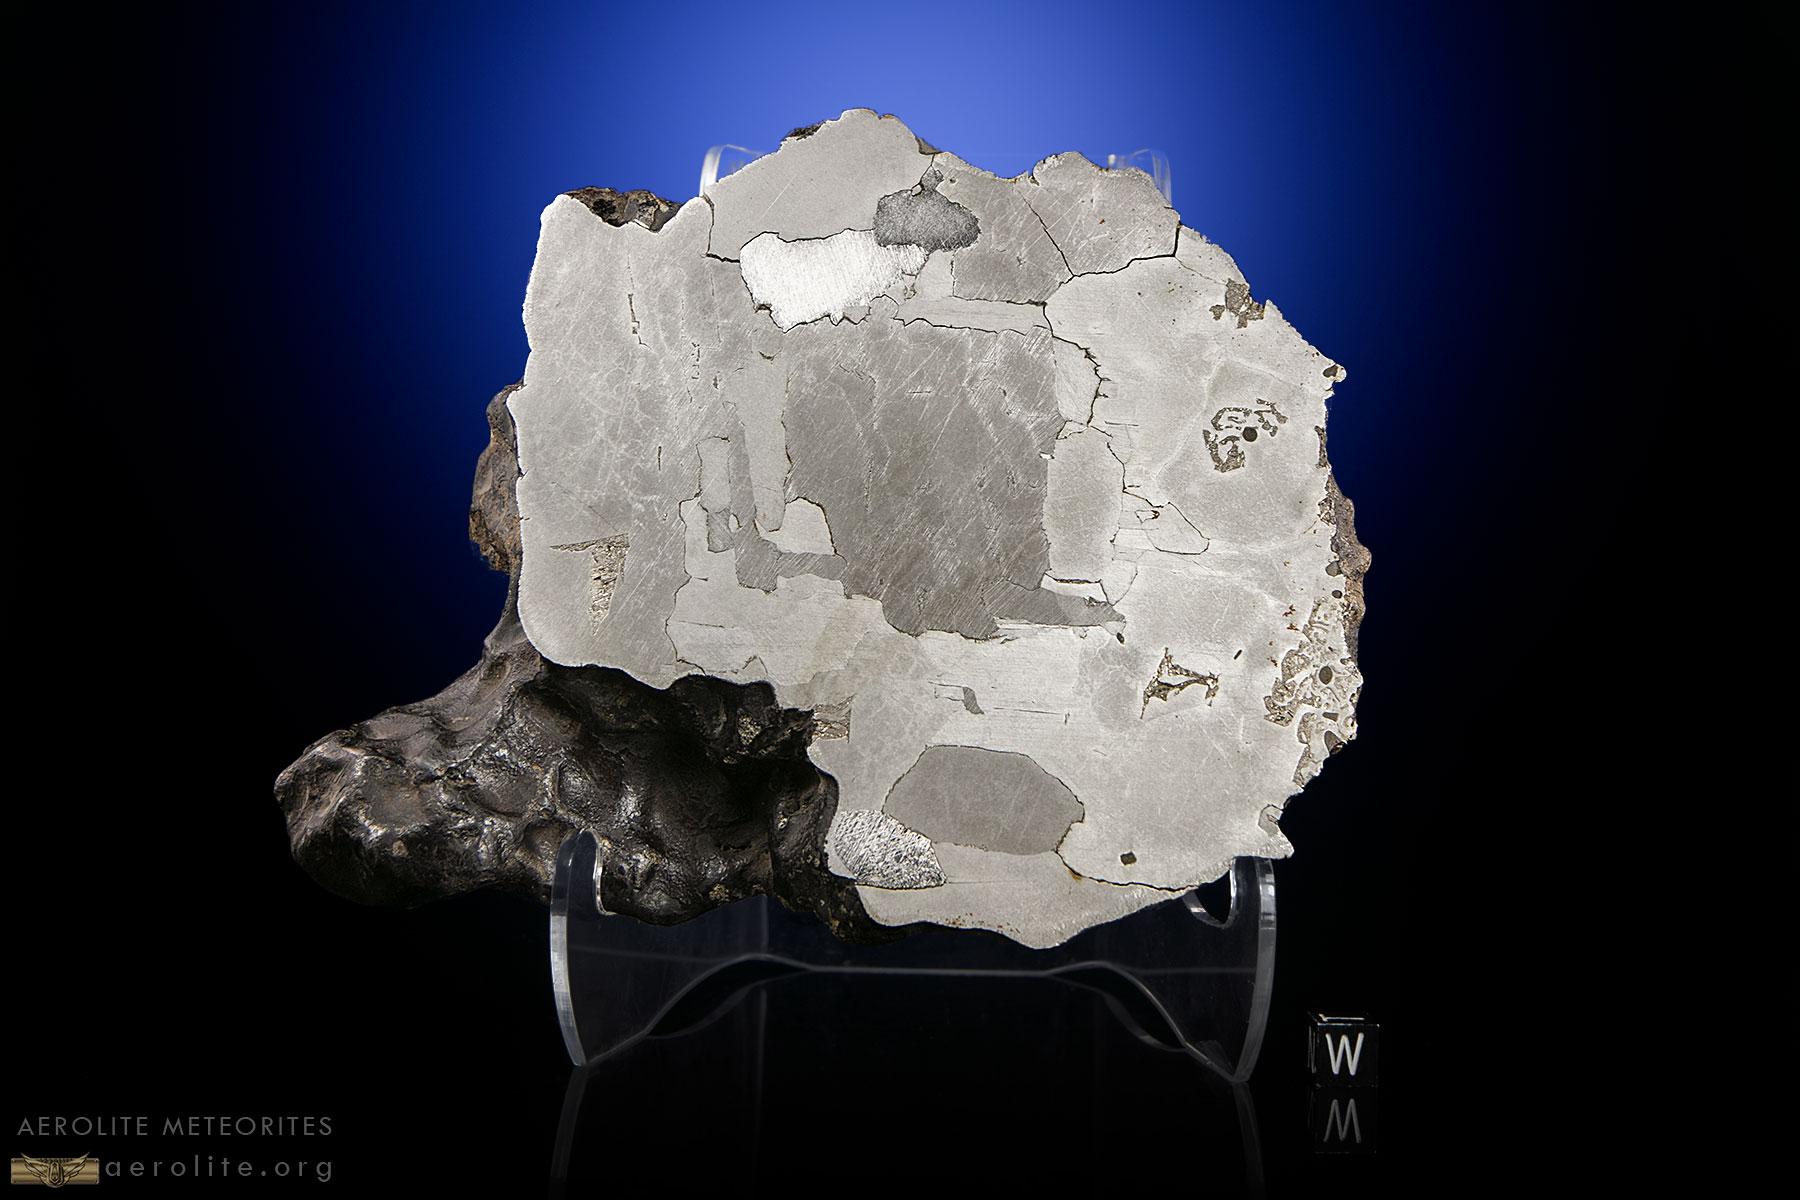 sikhote alin iron meteorite